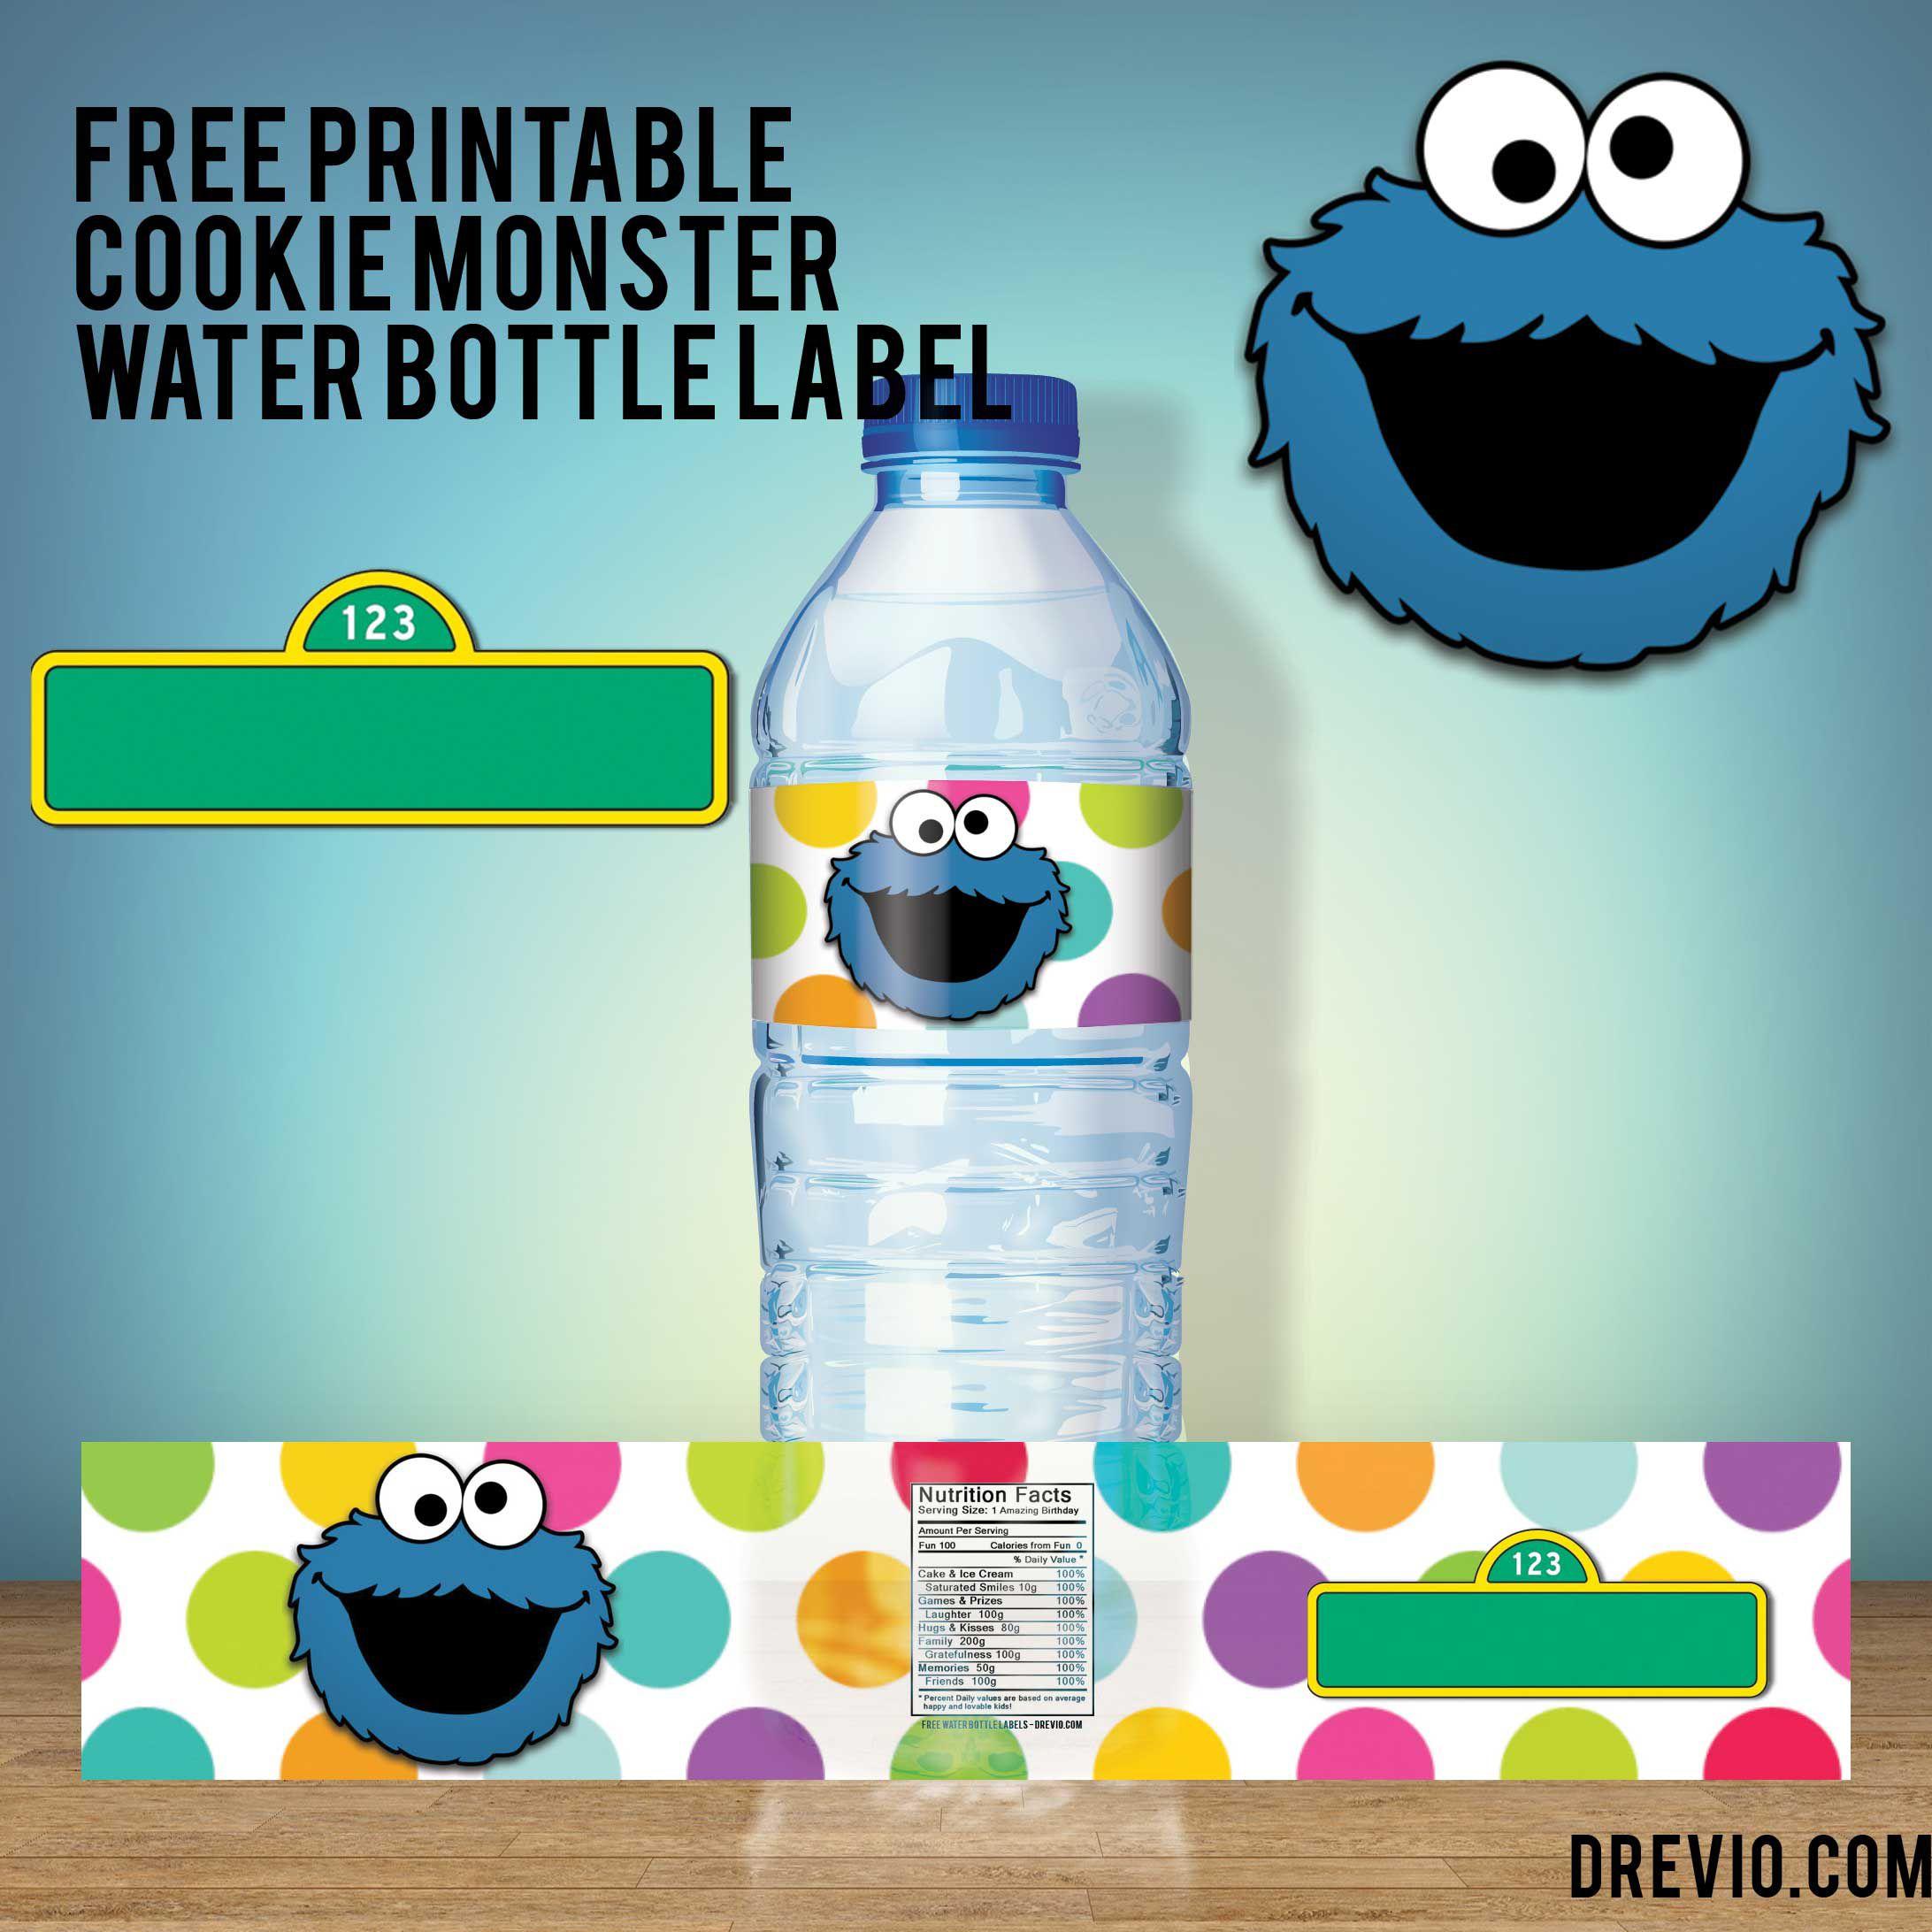 007 Unusual Water Bottle Label Template Free Image  Word Superhero PhotoshopFull